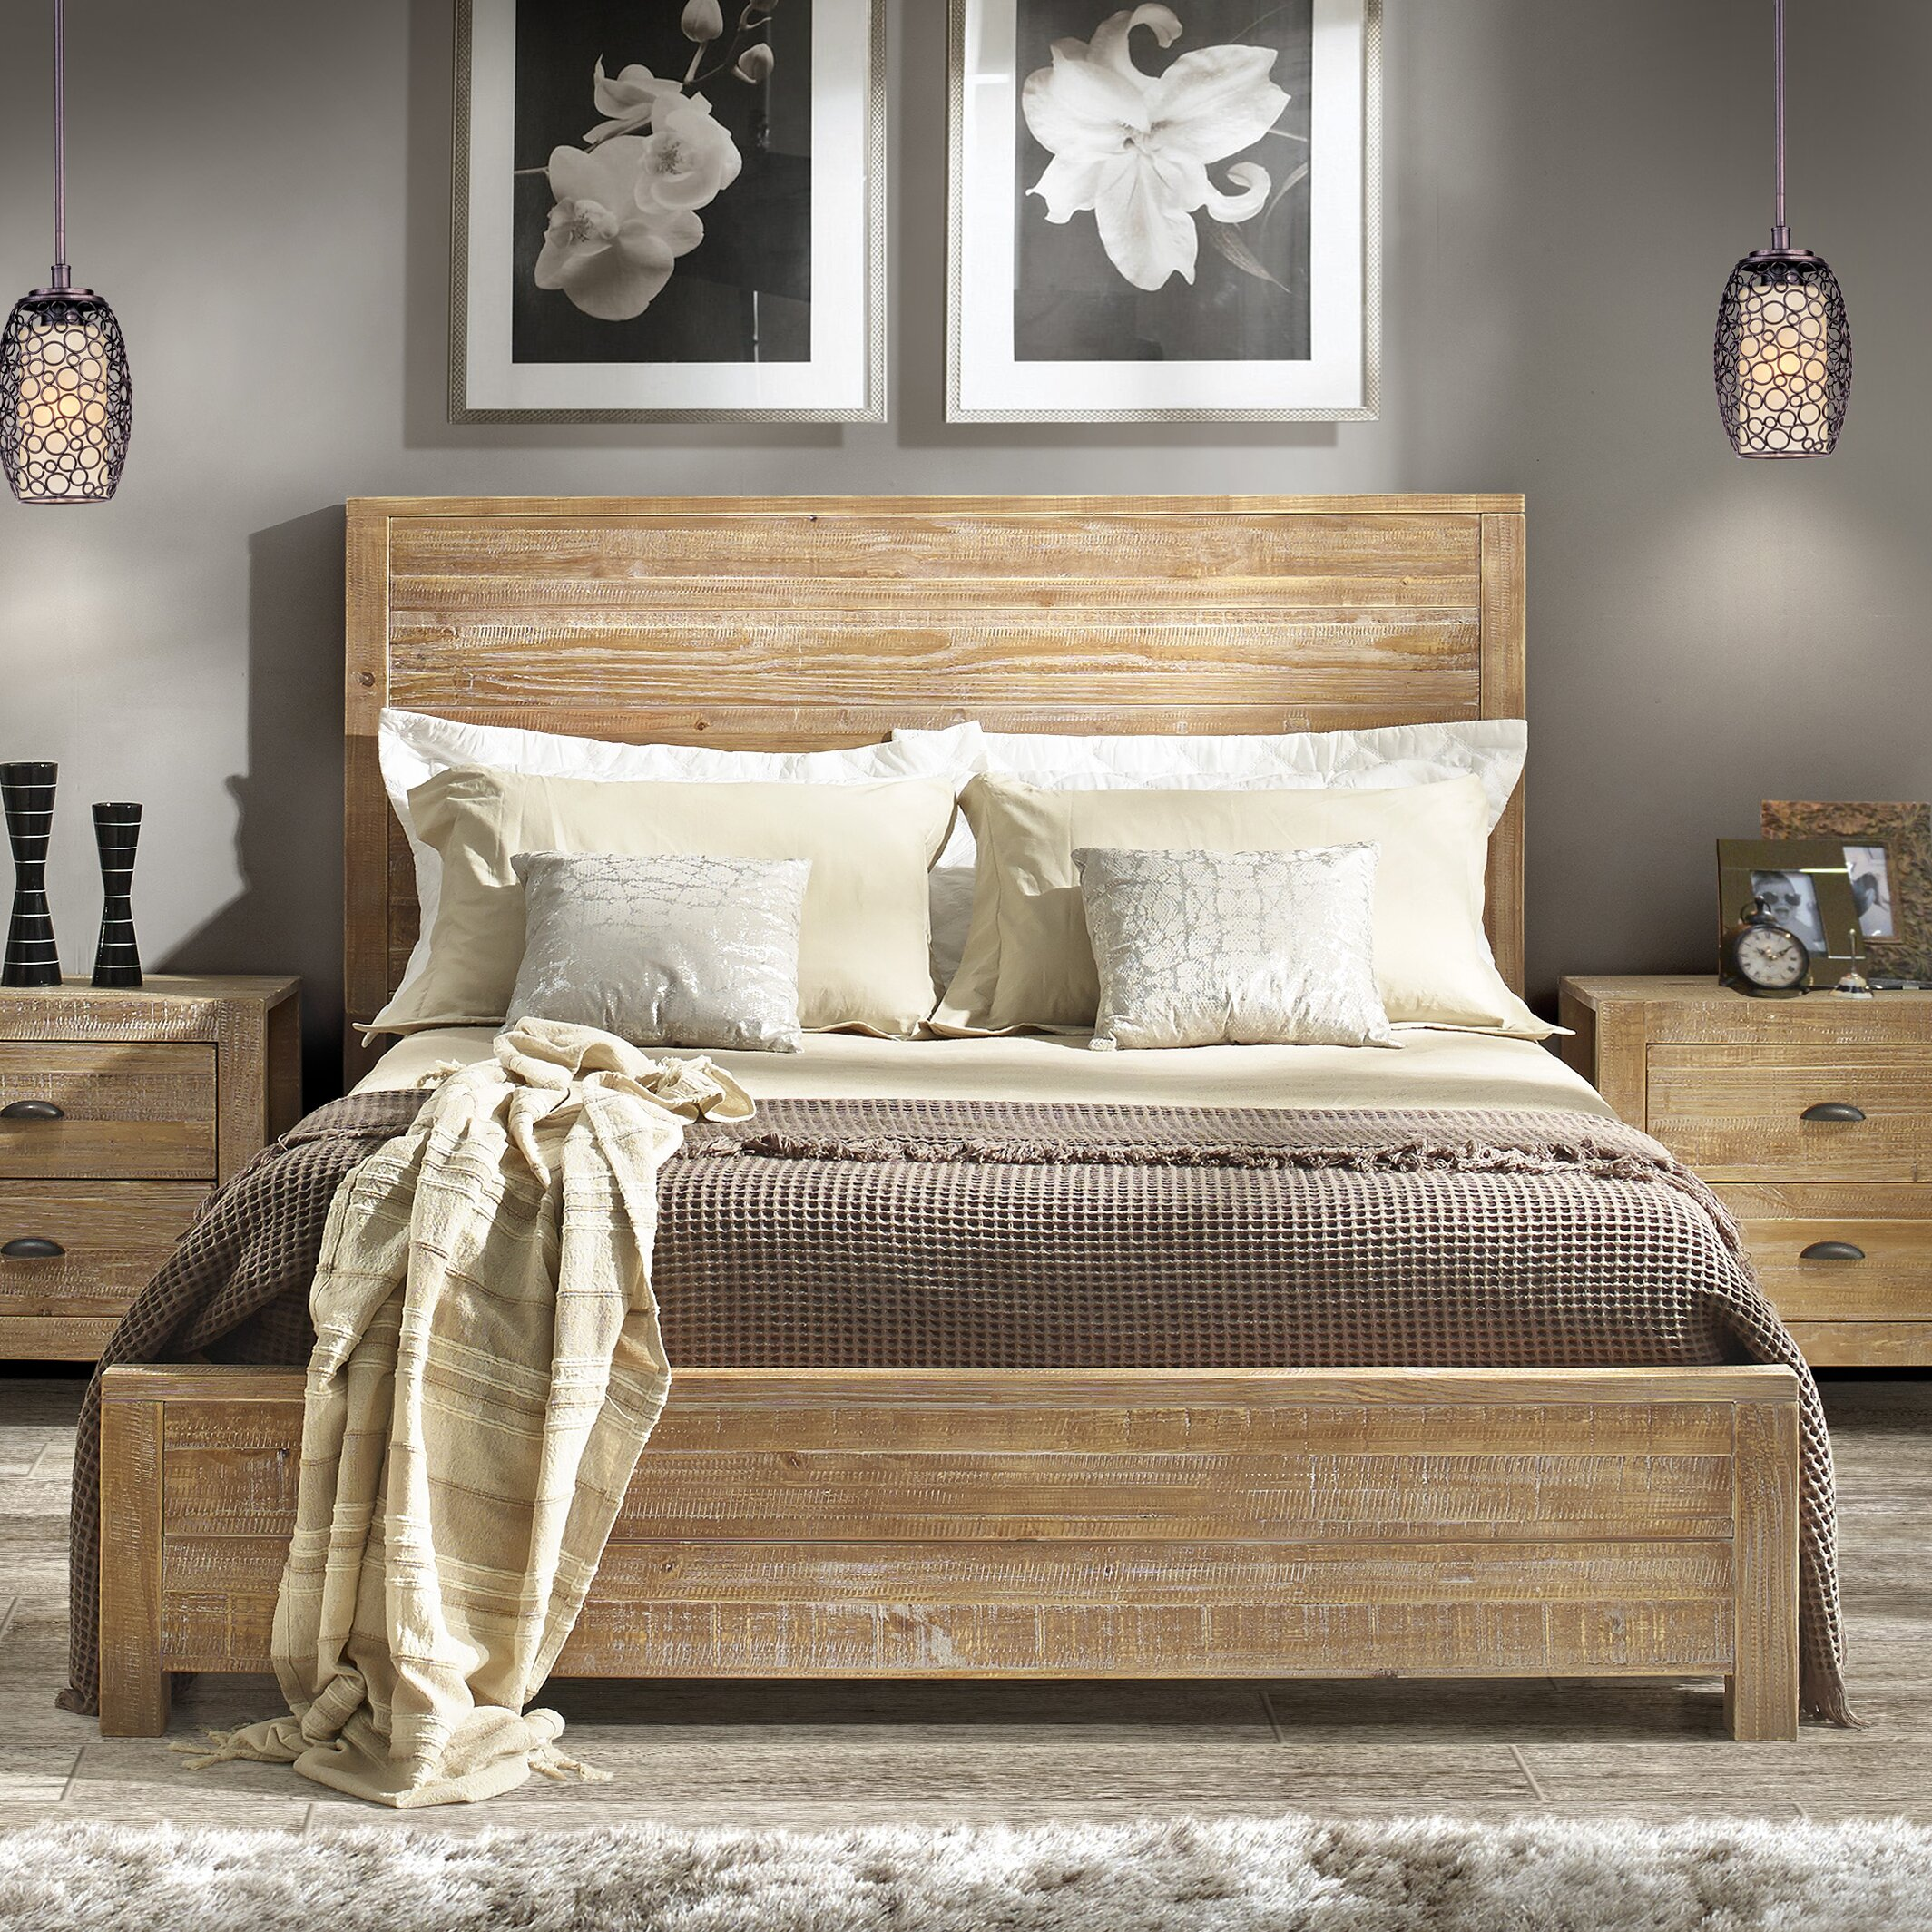 Bed Frame Wood Beds Bed: Grain Wood Furniture Montauk Bed Frame & Reviews